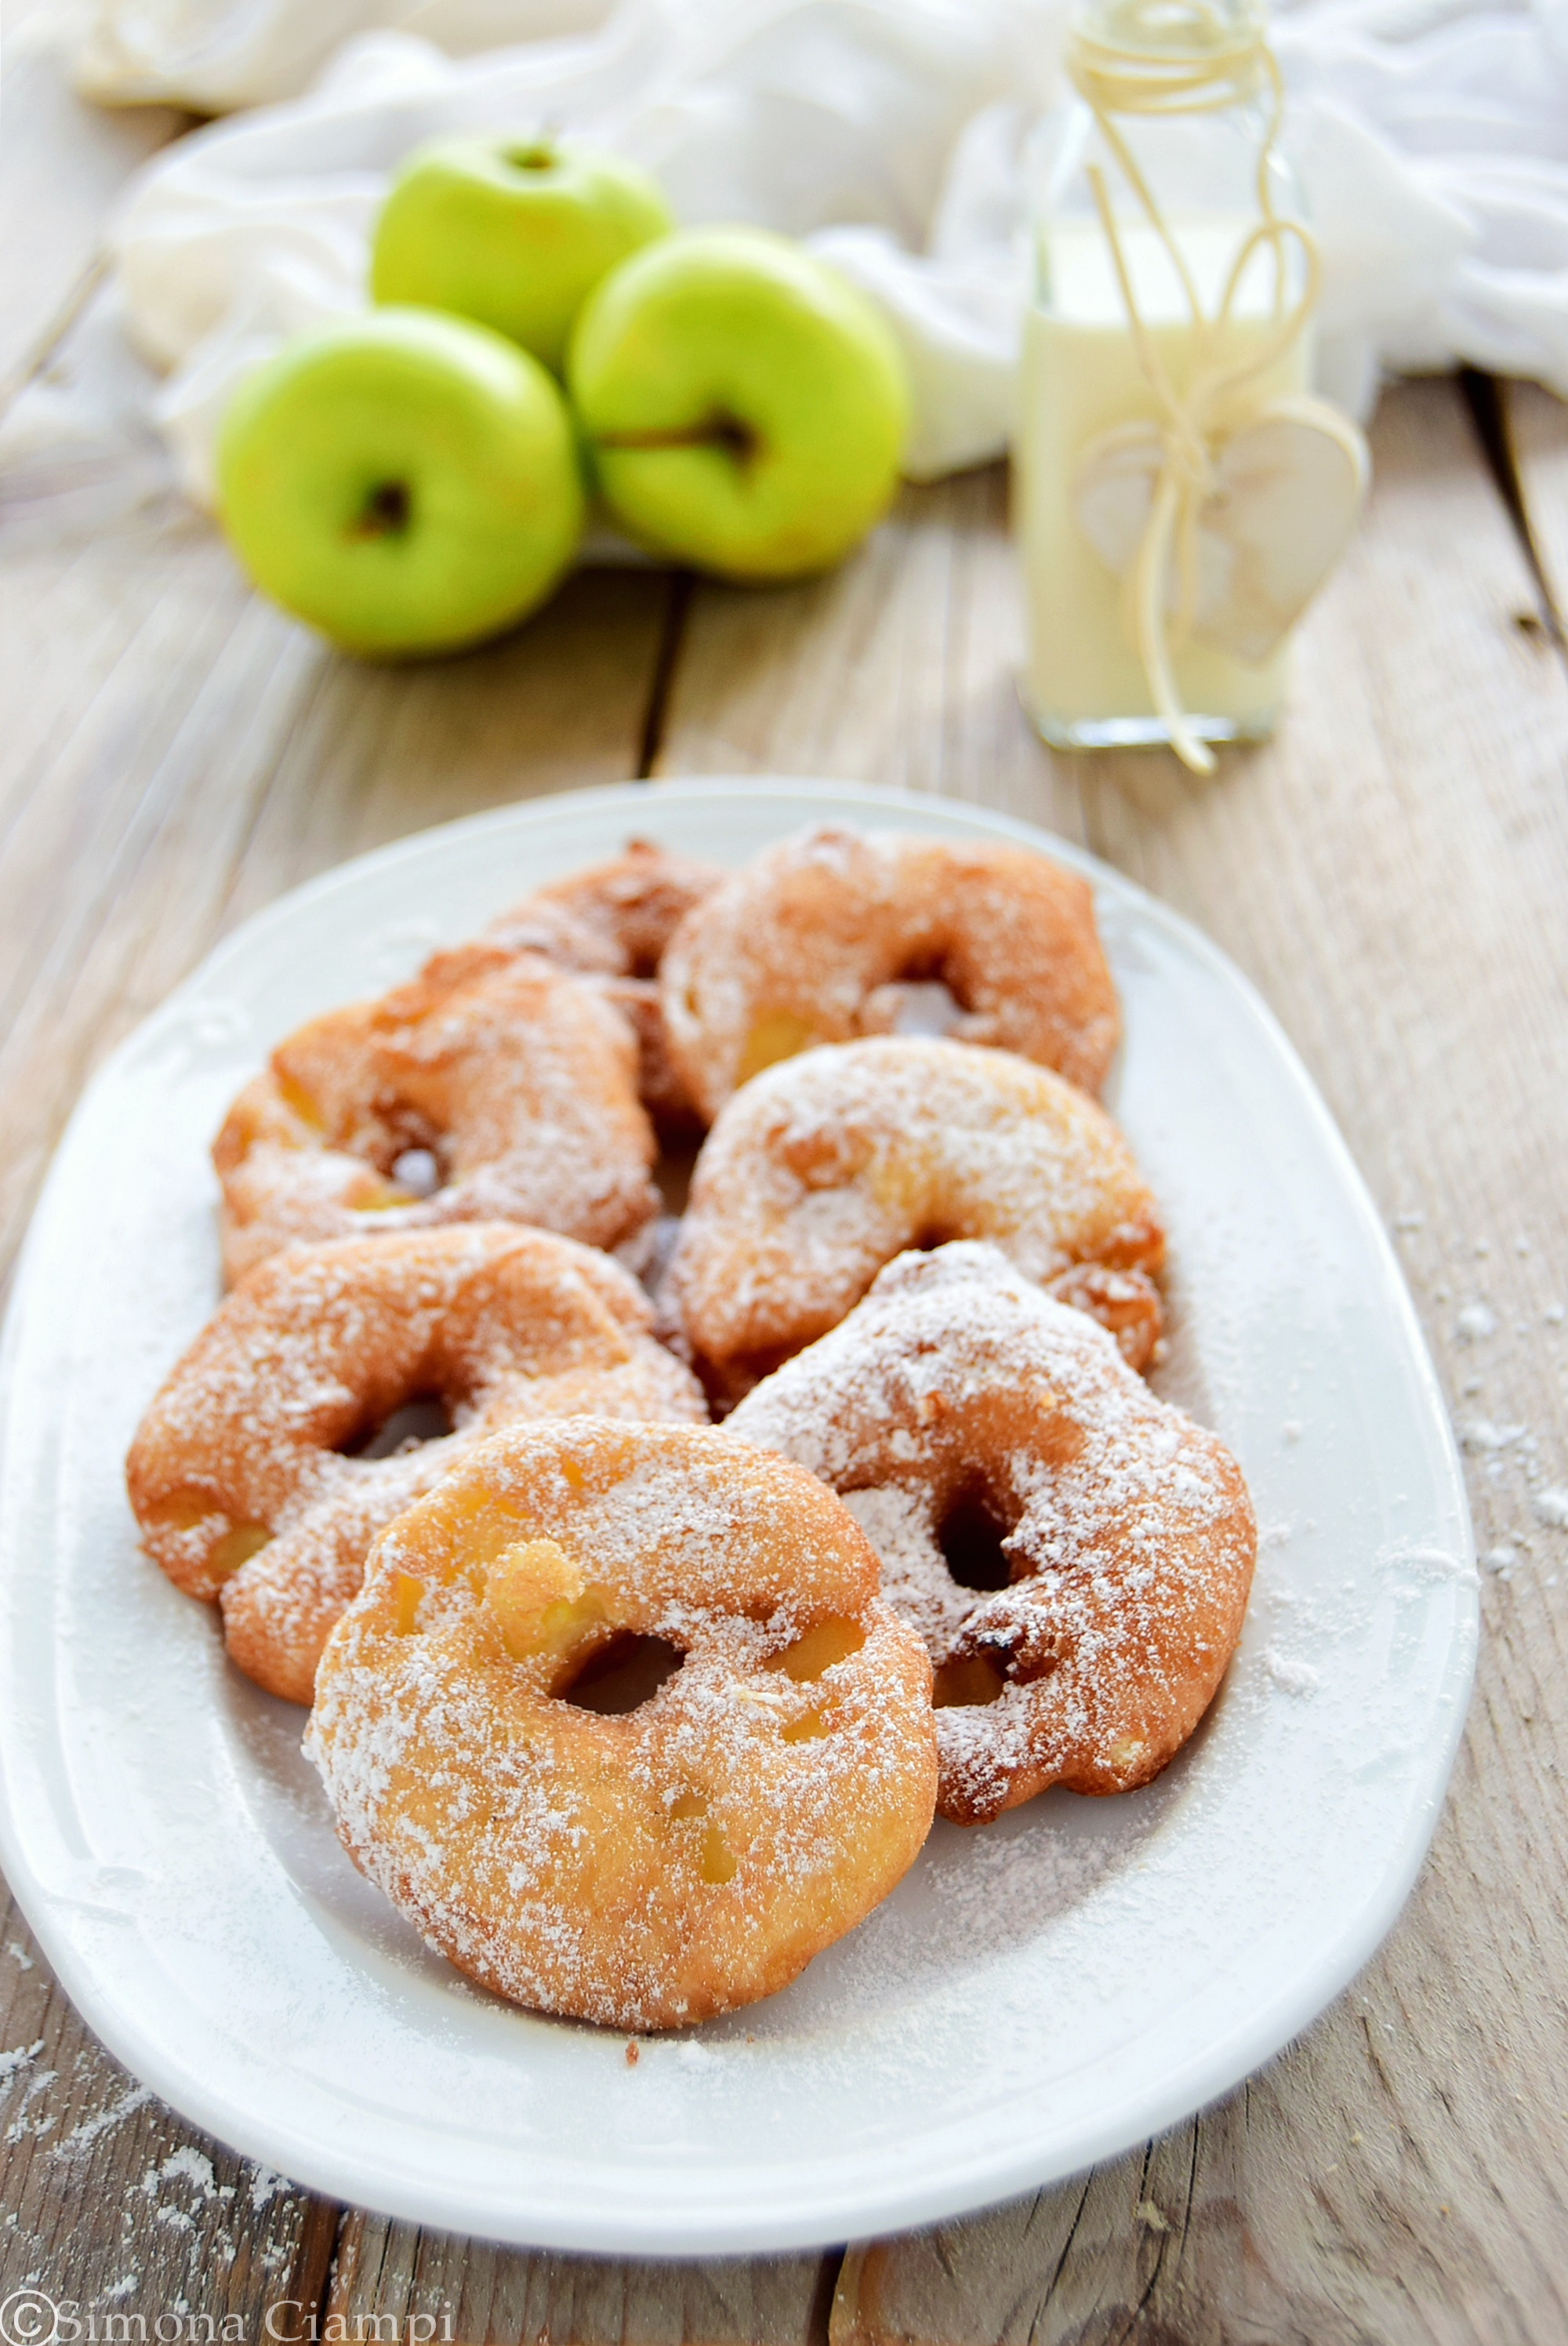 Frittelle di mele gonfie e veloci pronte in pochi minuti